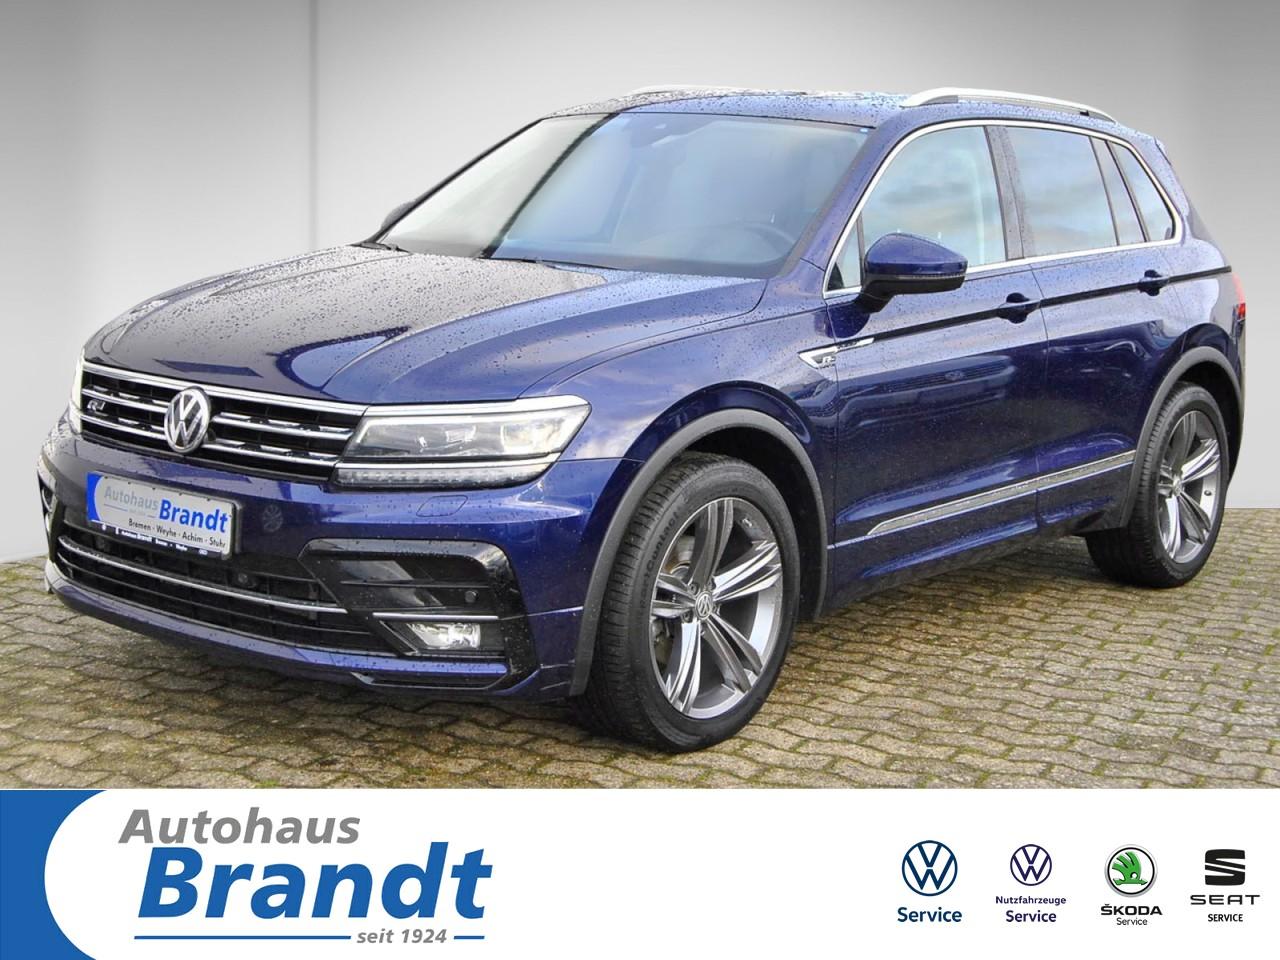 Volkswagen Tiguan 2.0 TDI DSG*LED*NAVI*ACC*PANO*HUD*R-LINE, Jahr 2017, Diesel